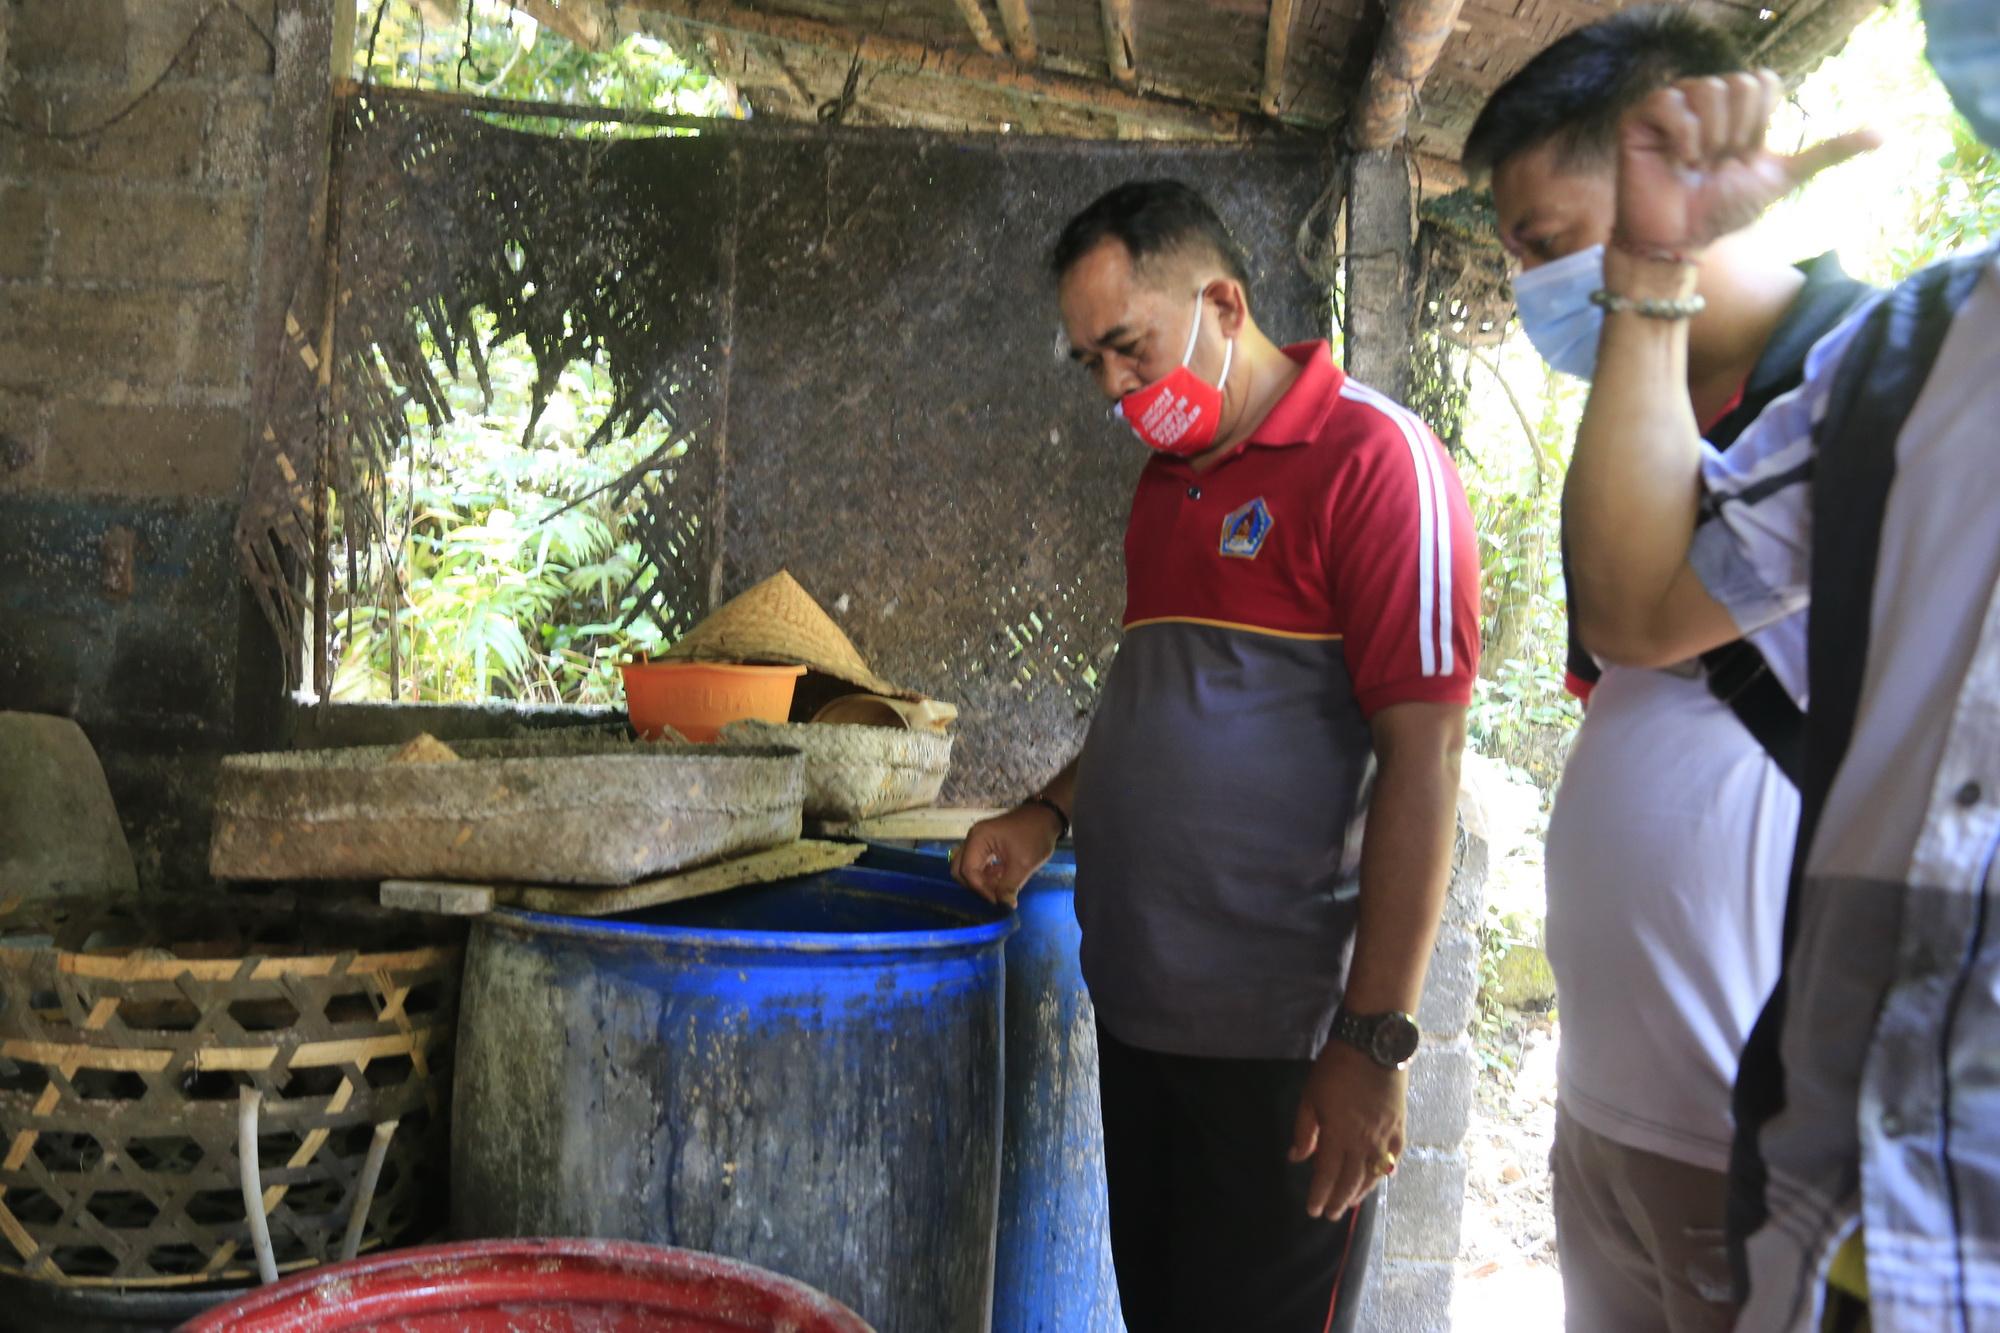 WABUP Kasta meninjau proses produksi petani arak tradisional di Desa Besan Kanginan, Kecamatan Dawan, Jumat (20/11/2020). Foto: ist